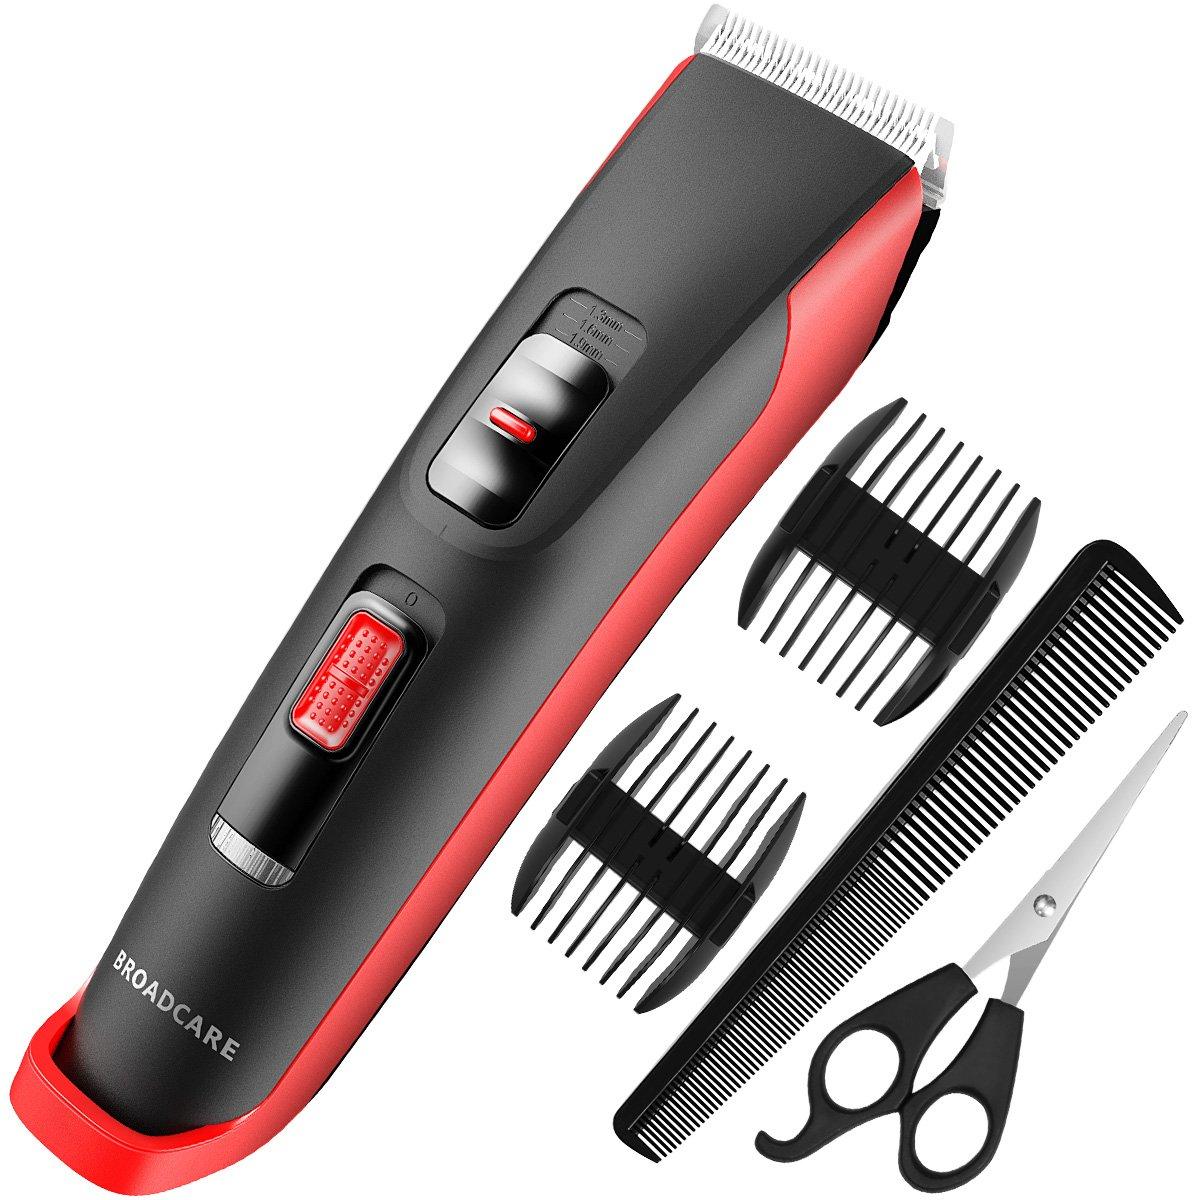 Hair Clippers Cordless Hair Trimmer for Men, BROADCARE Men's Hair Clipper Kit